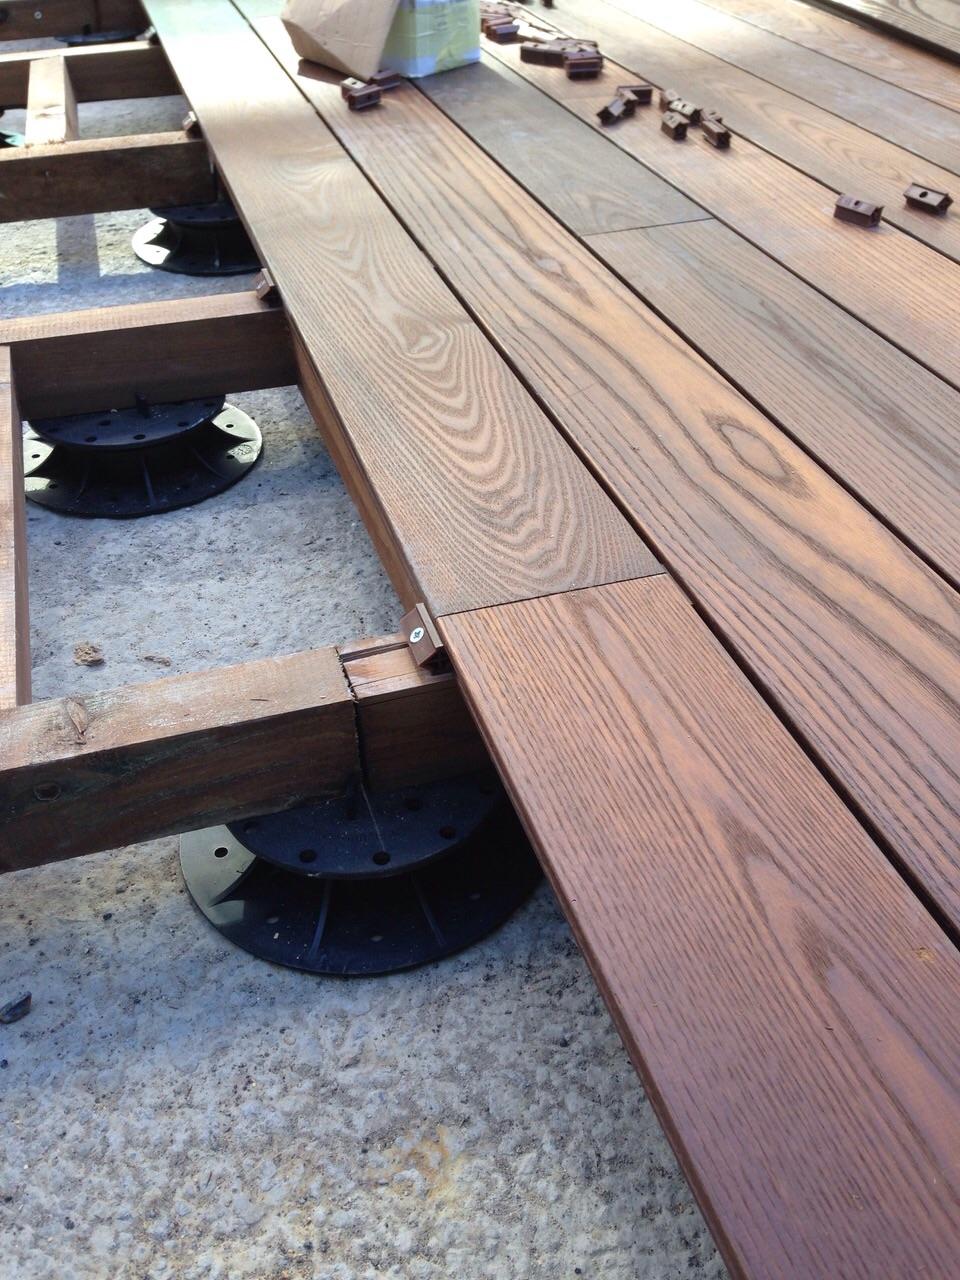 New Amazing Outdoor Plastic Floor Tiles Decor Units